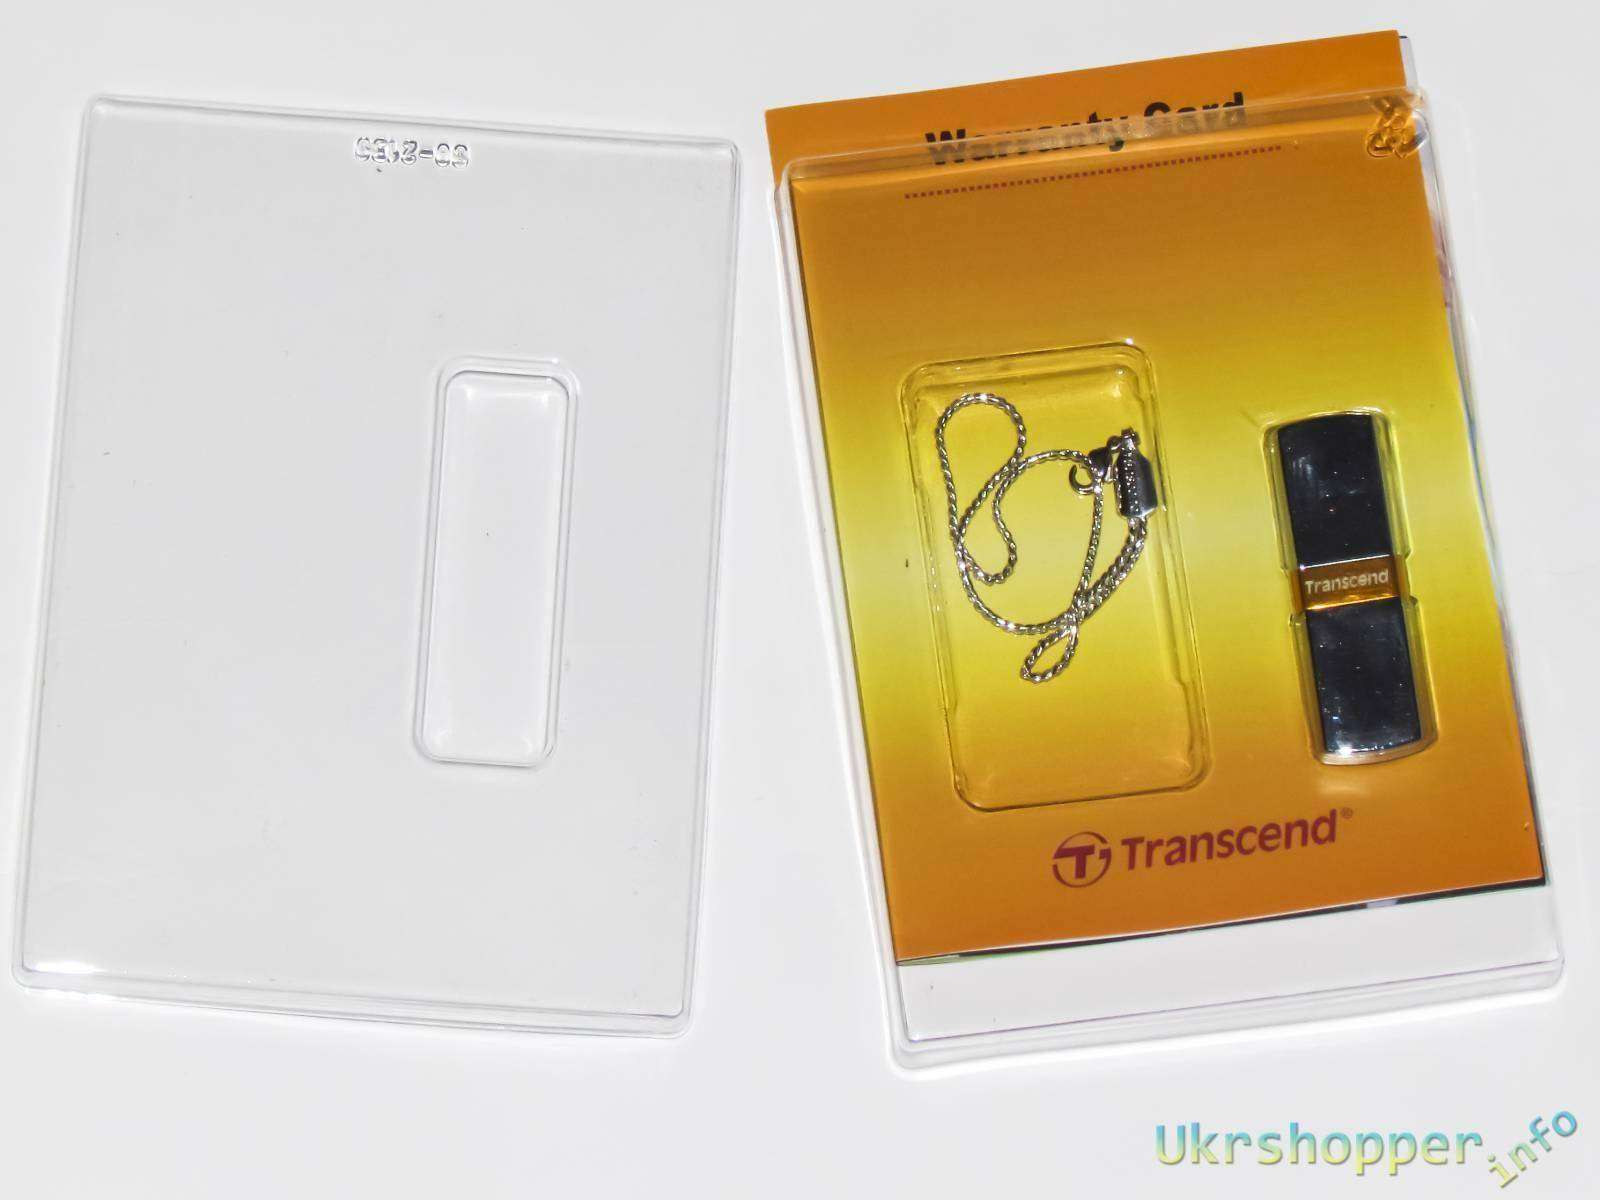 Сокол: Full metal jacket - обзор металлической зубонепрогрызаемой флешки Transcend JetFlash V85